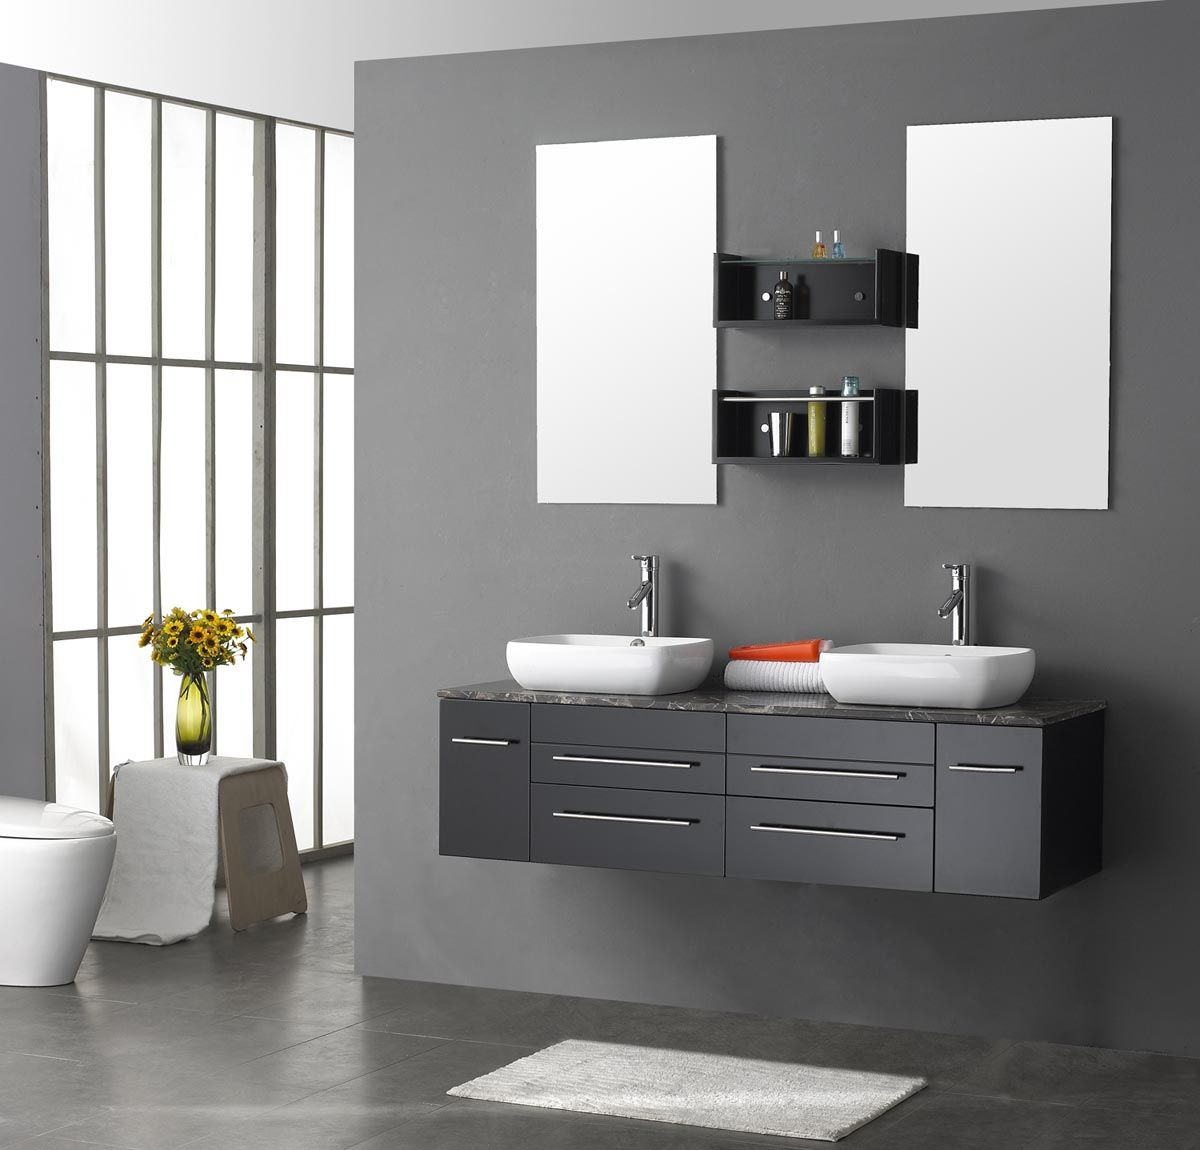 Modern Bathroom Vanity Ideas Plovf Modern Design Shower Safety Non New Designer Bathroom Cabinet 2018